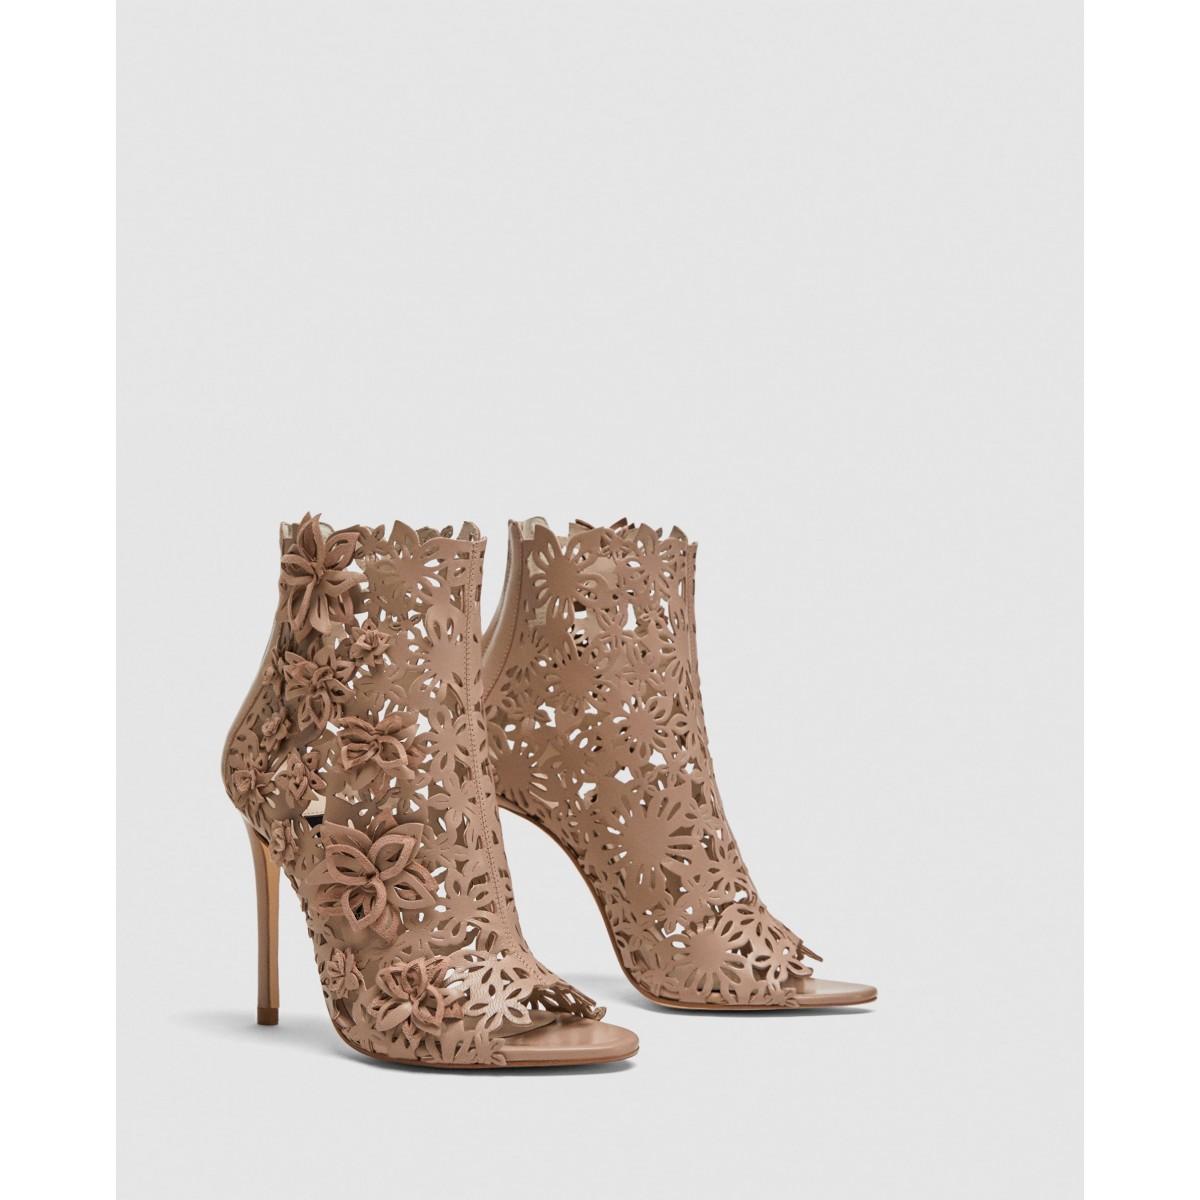 Zara Wraparound Leather High-Heel Sandals With Flowers